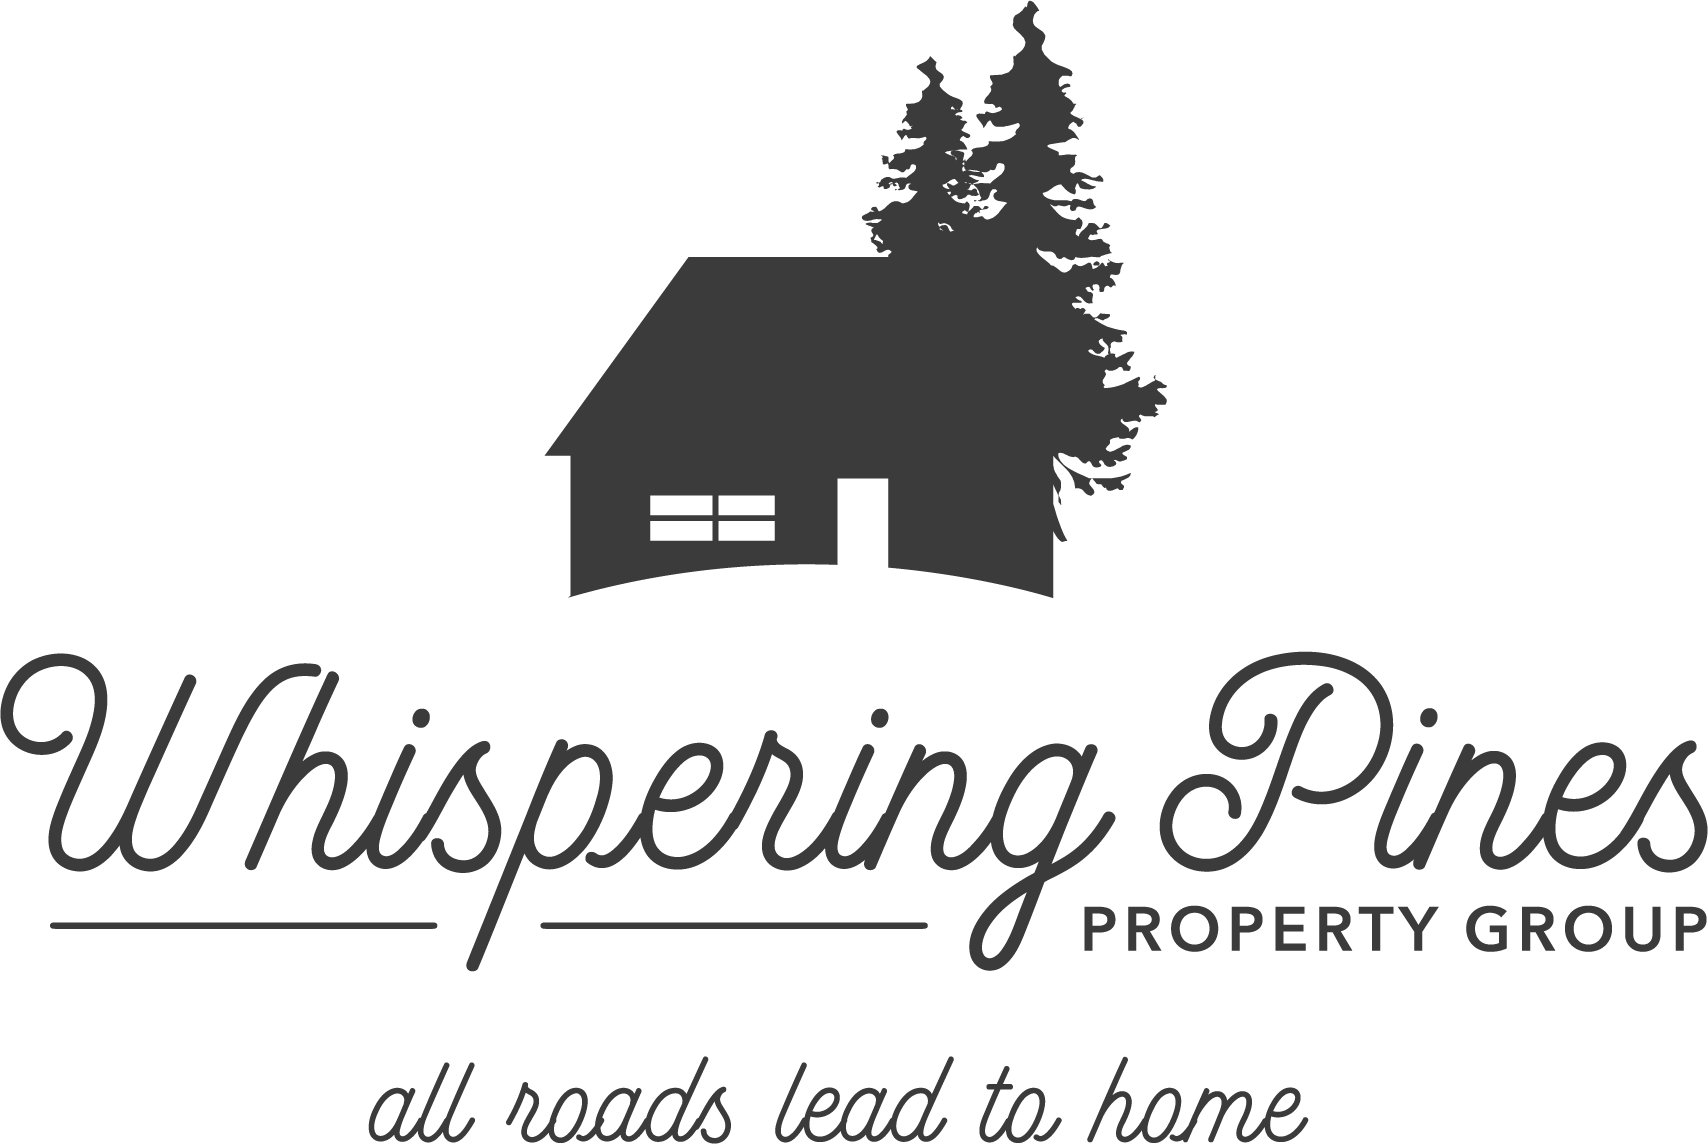 WhisperingPines-PG-Logo-Charcoal-WEB.png